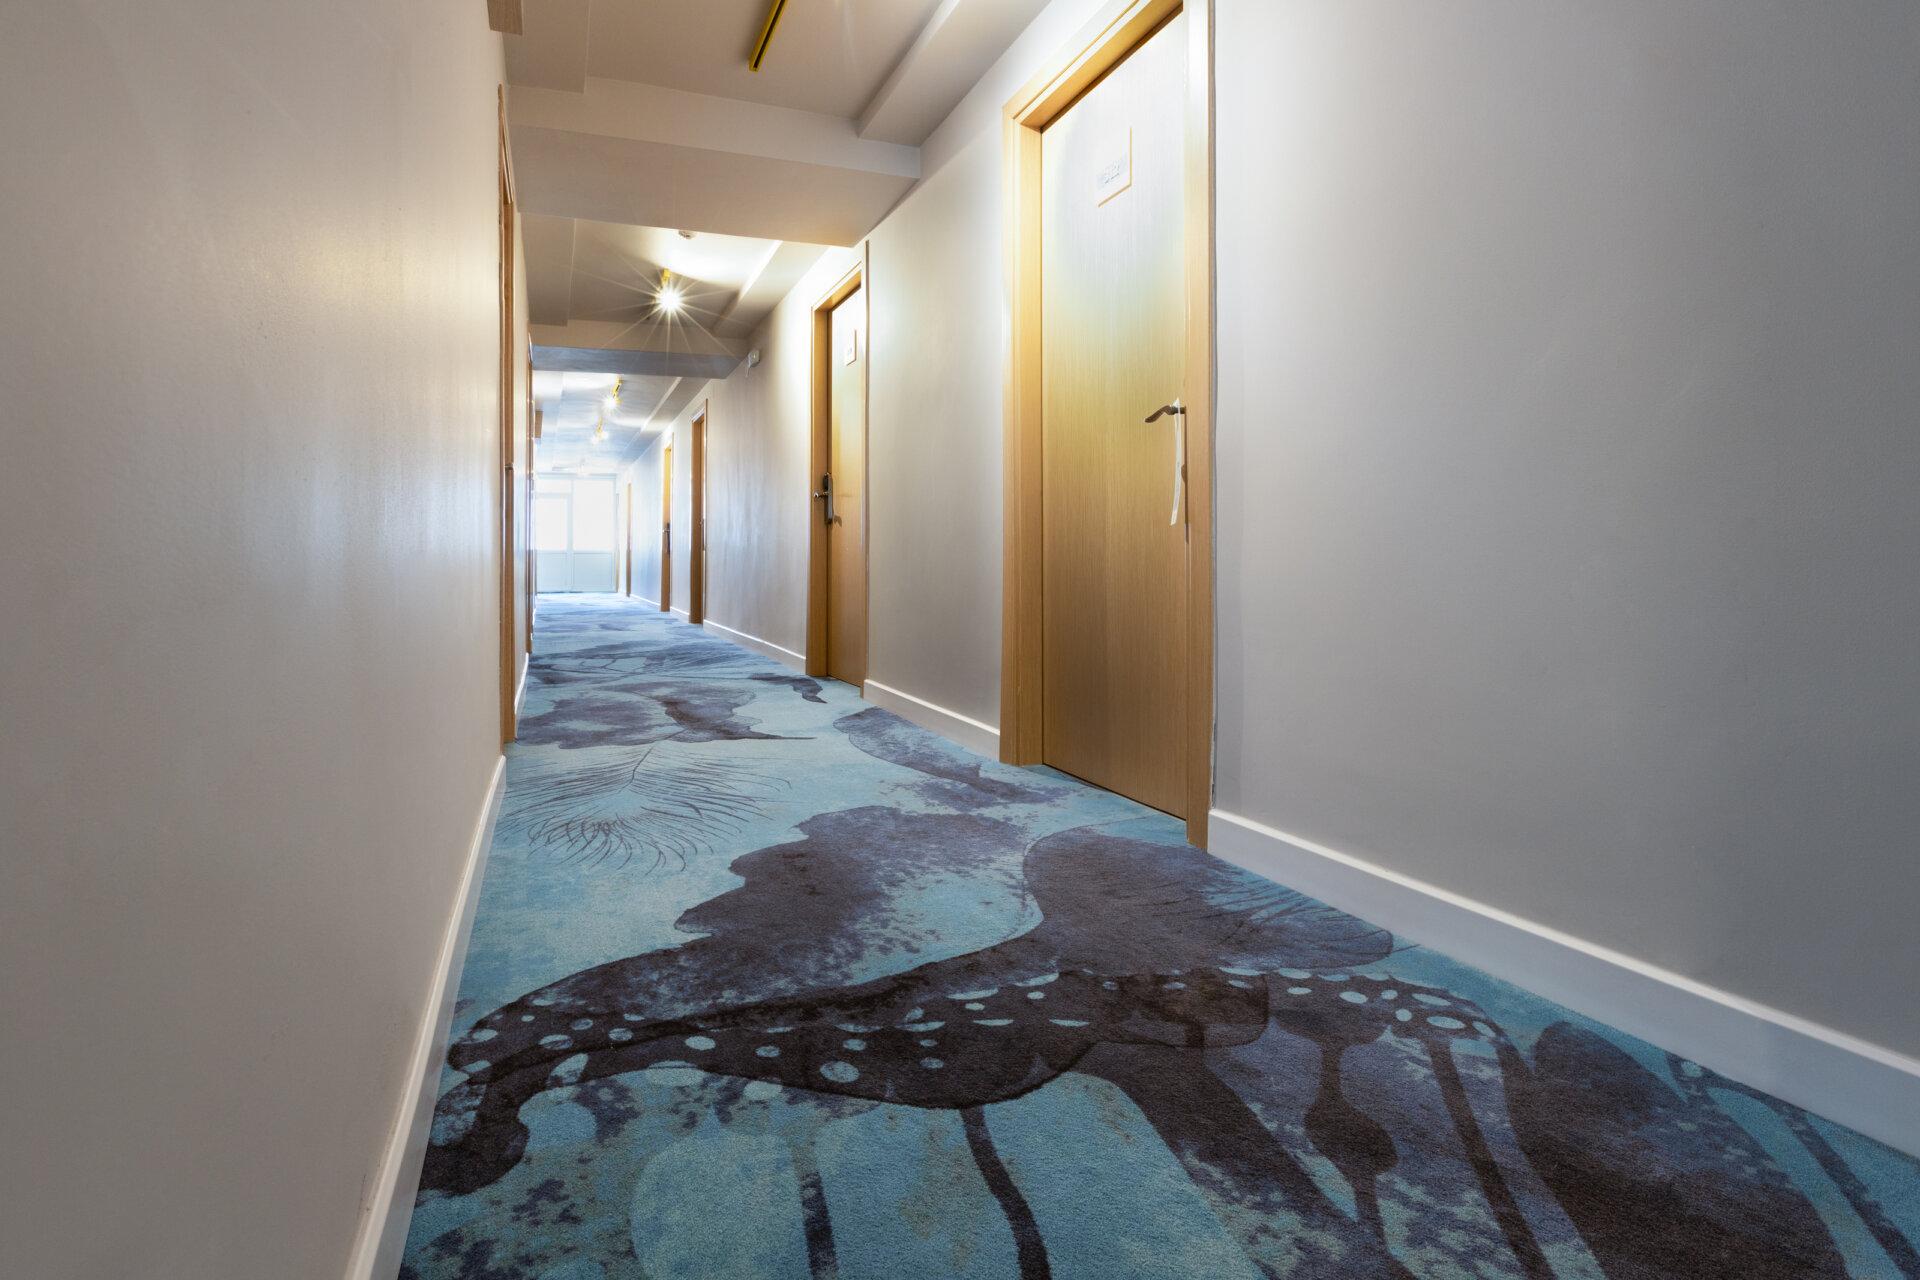 20210609-carpet&more-ibis-styles-galati-by-hugmedia-29